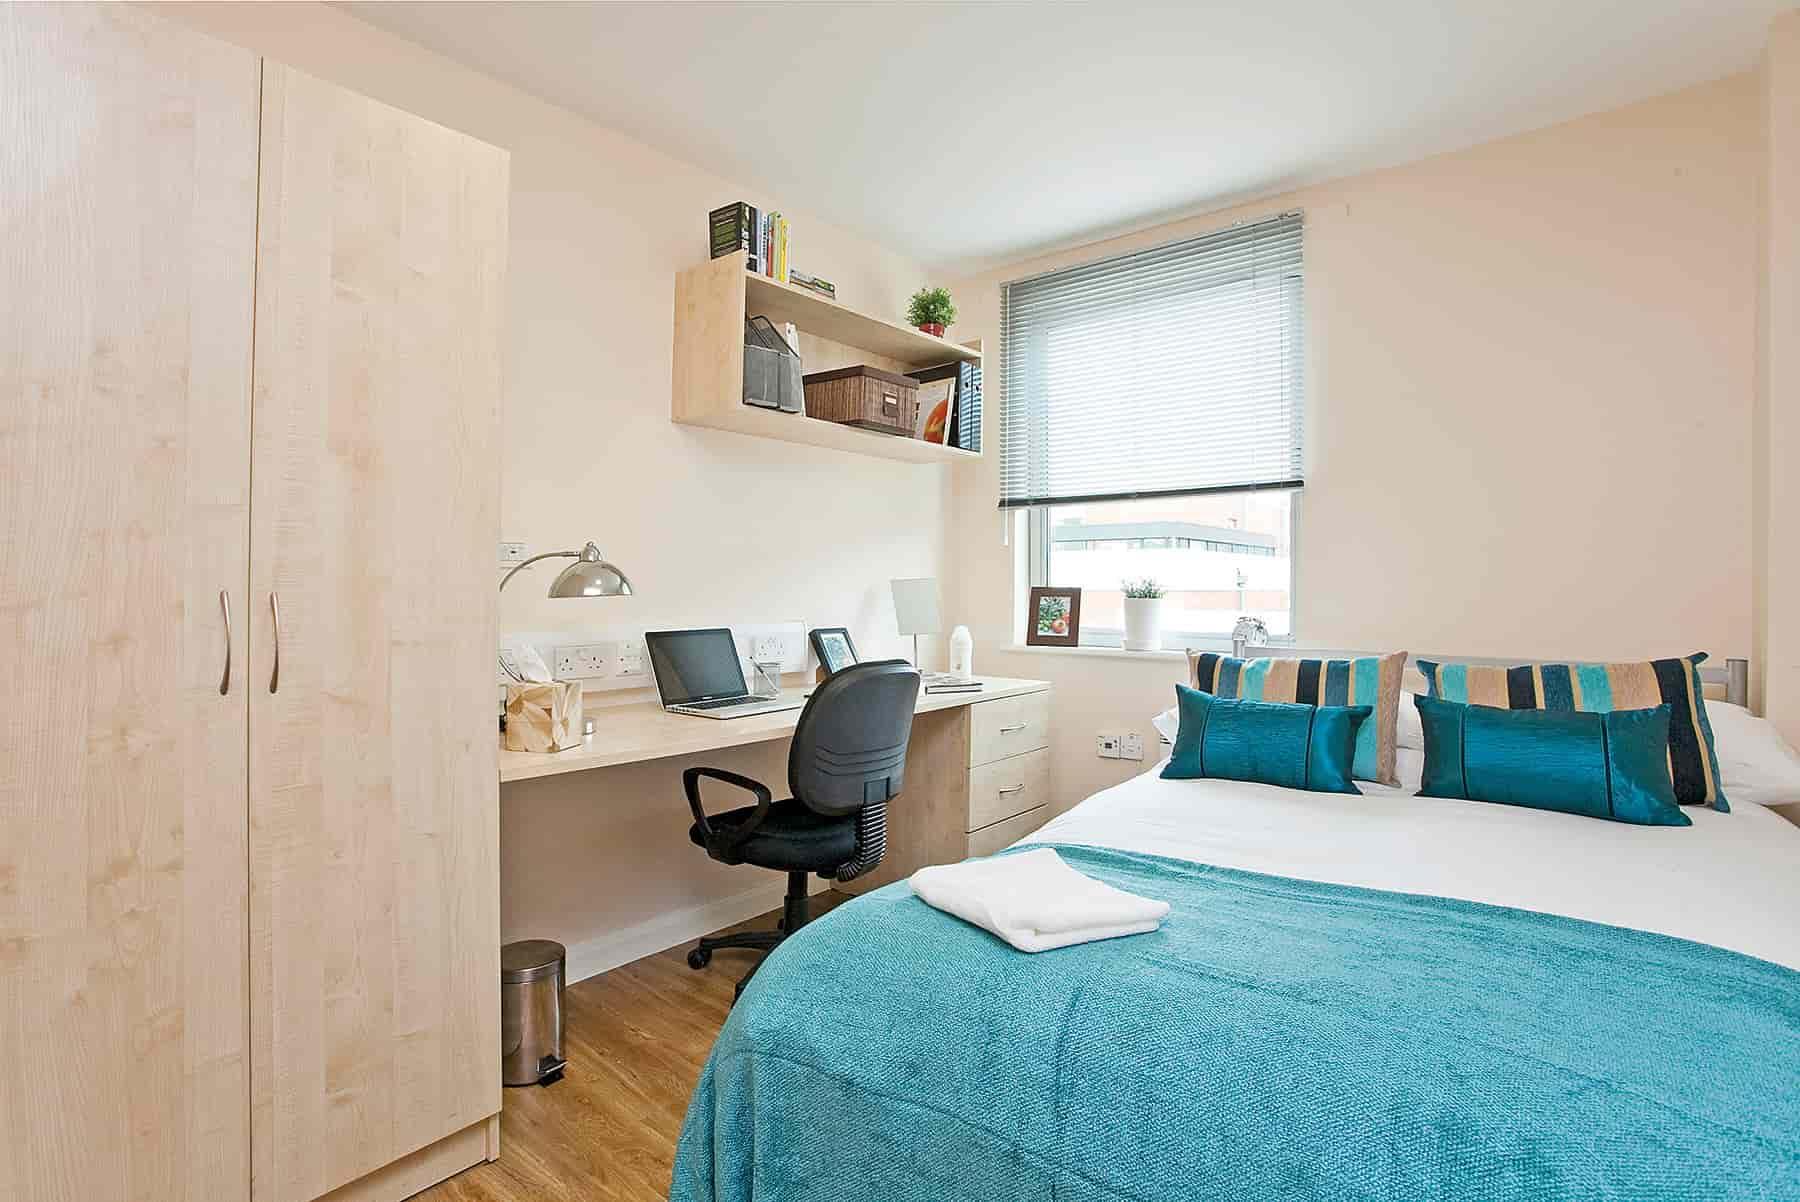 Leodis-Leeds-Bedroom-2-Unilodgers (1)